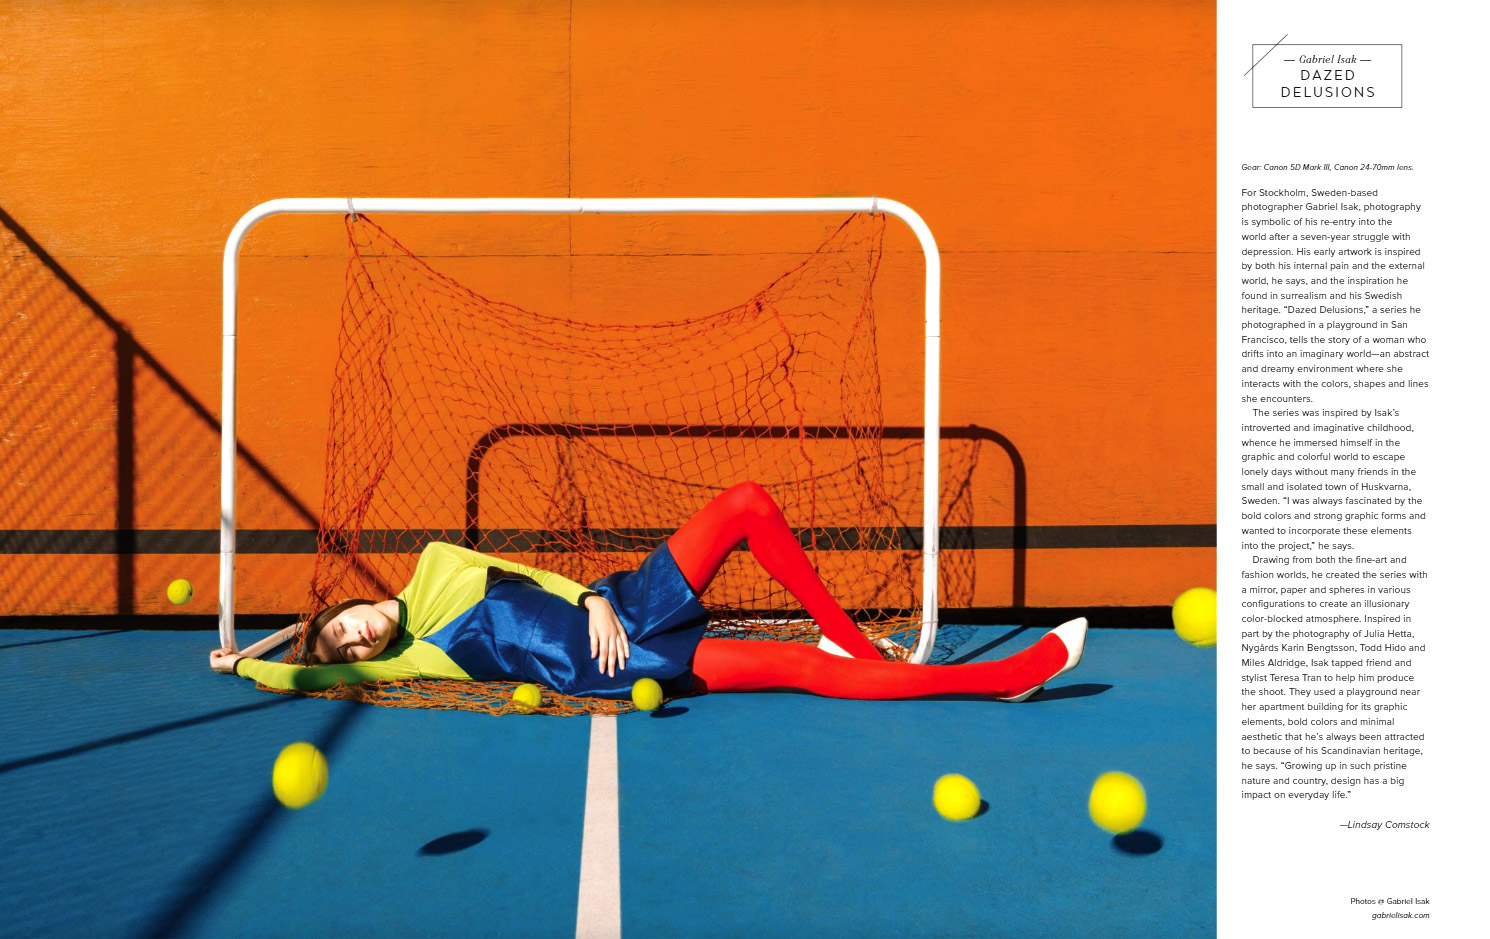 Dazed Delusions, © Gabriel Isak, Emerging Photographer